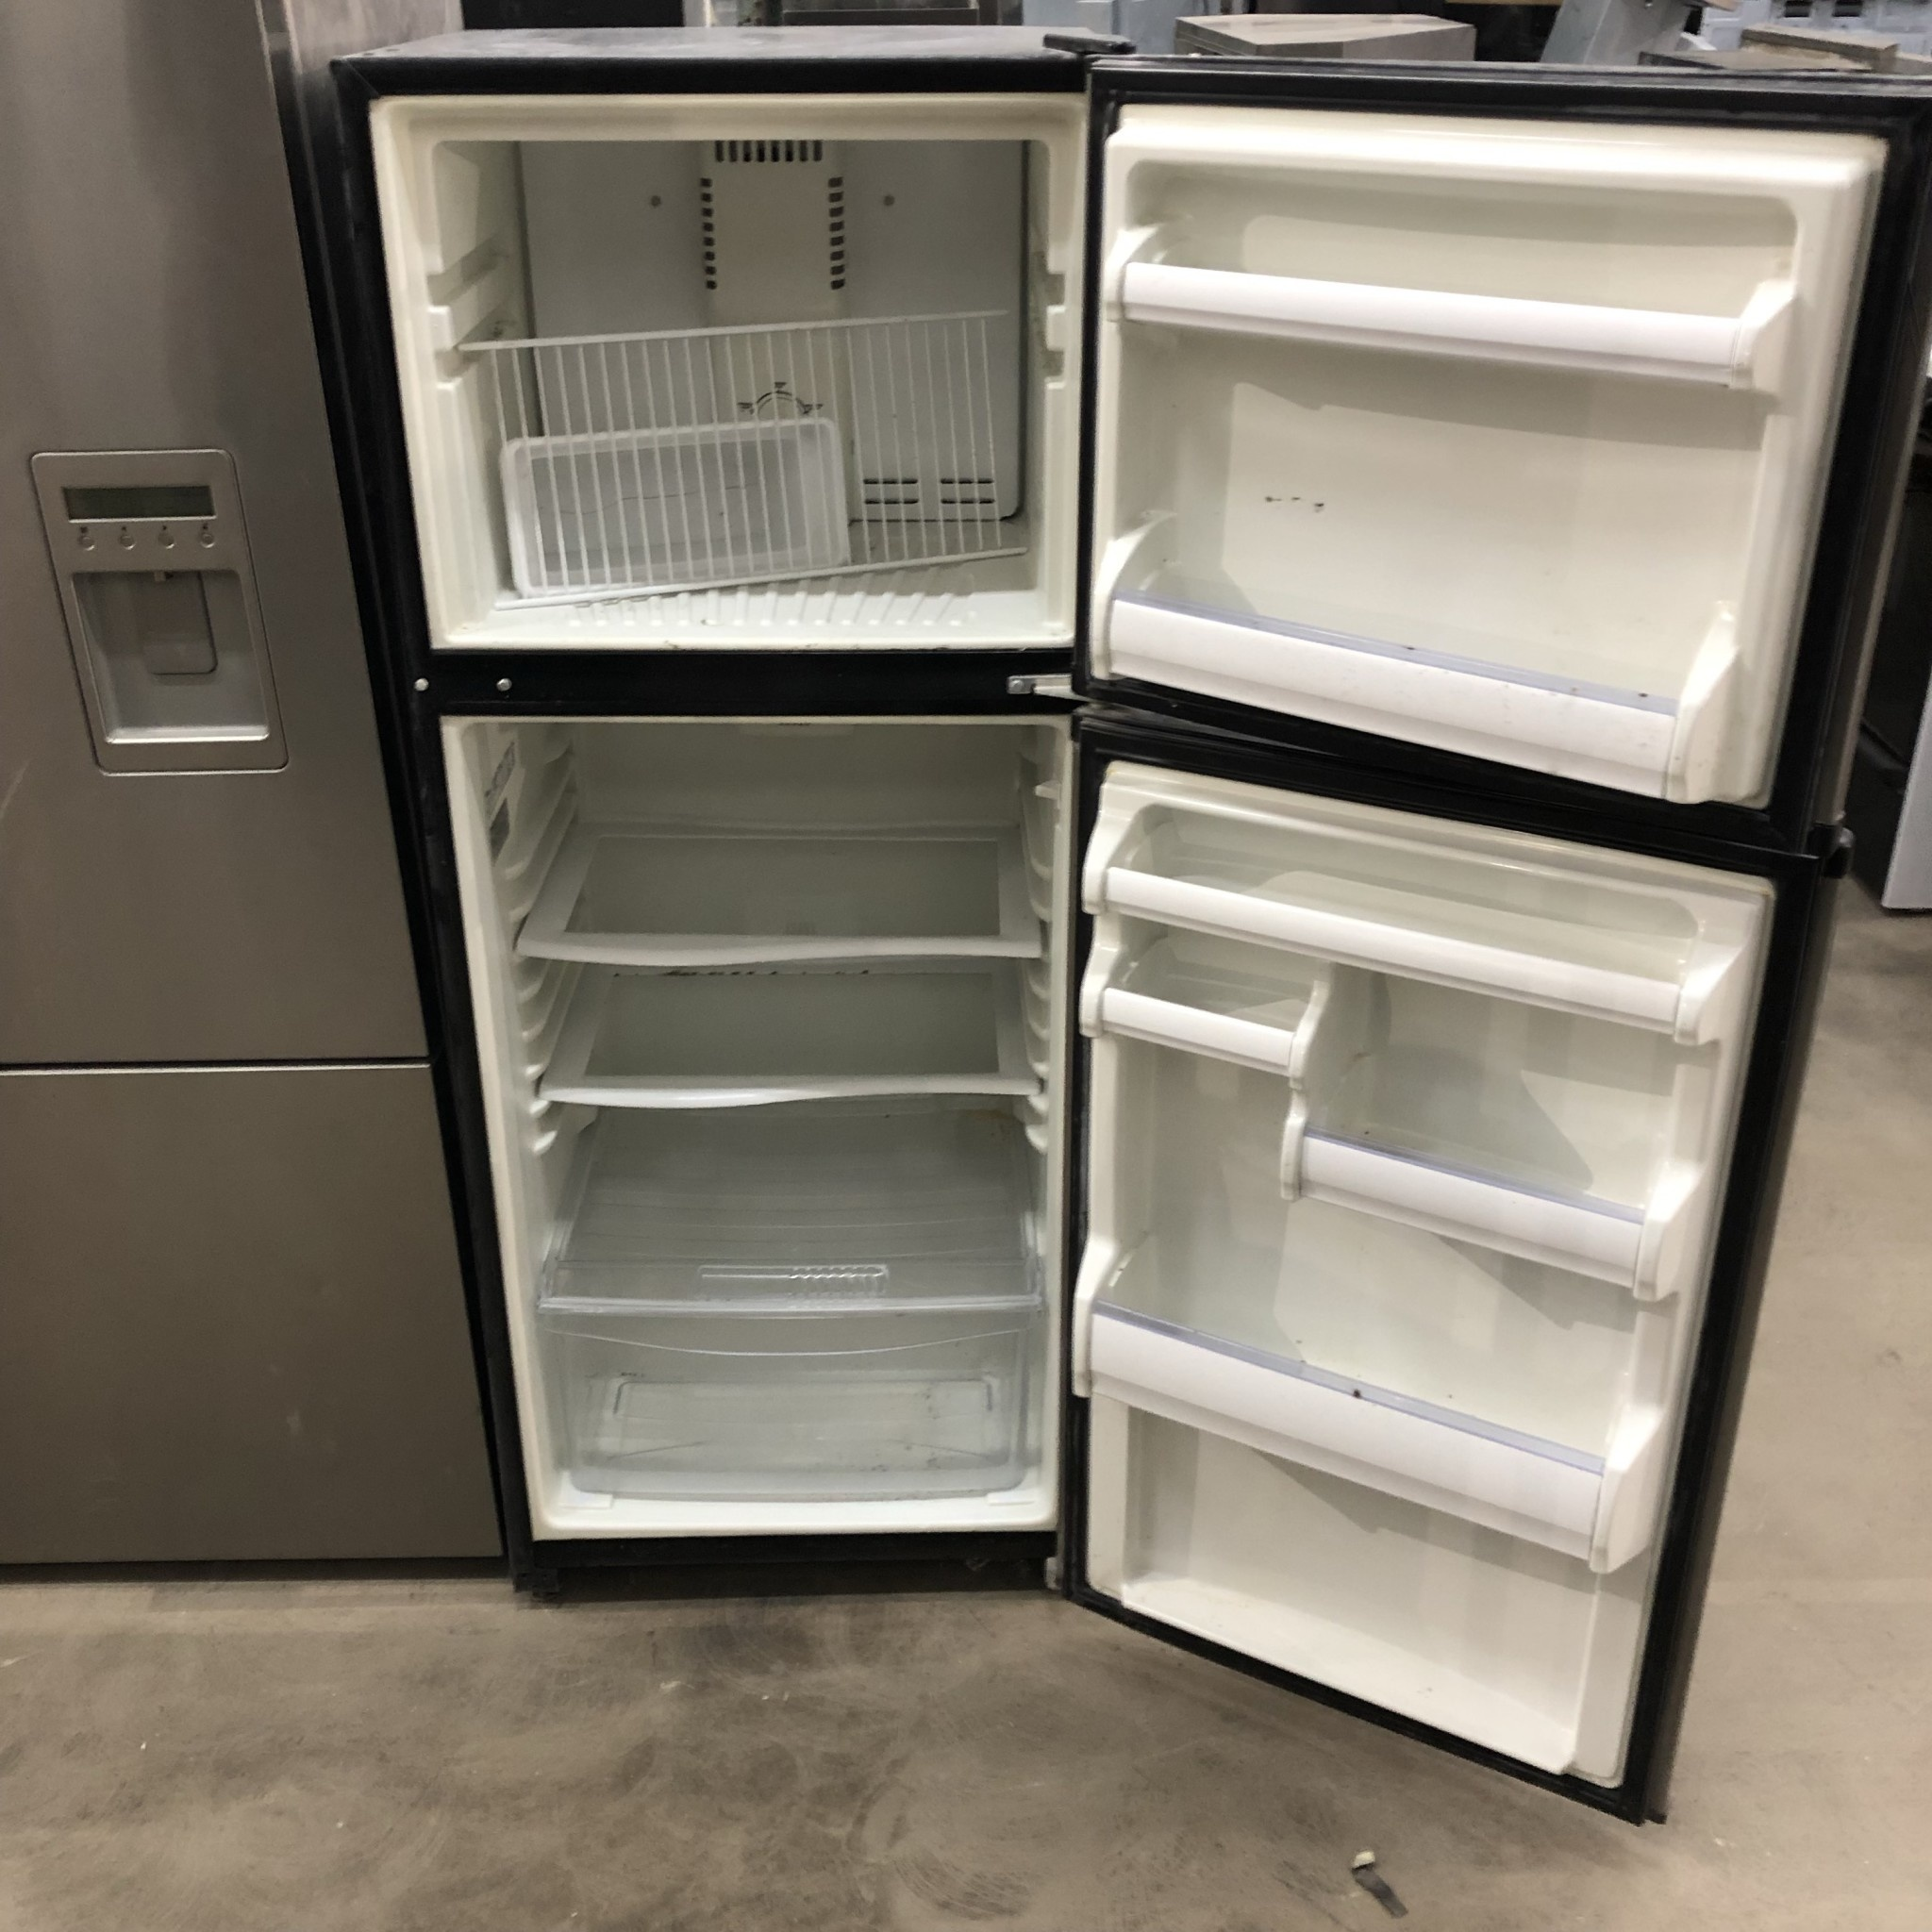 Whirlpool Stainless Steel Refrigerator